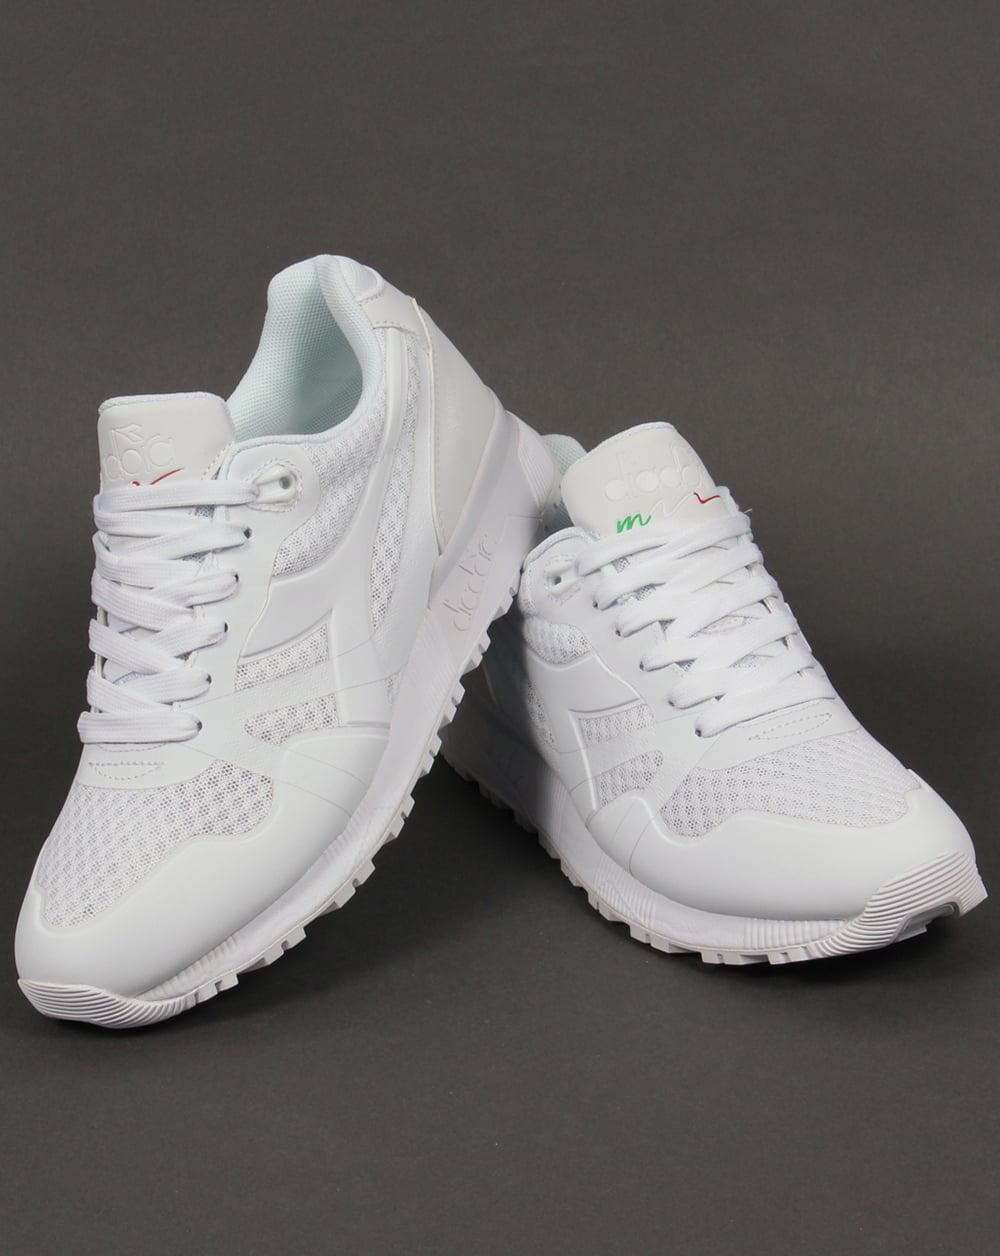 c2278aab Diadora N9000 MM II Trainers White/White